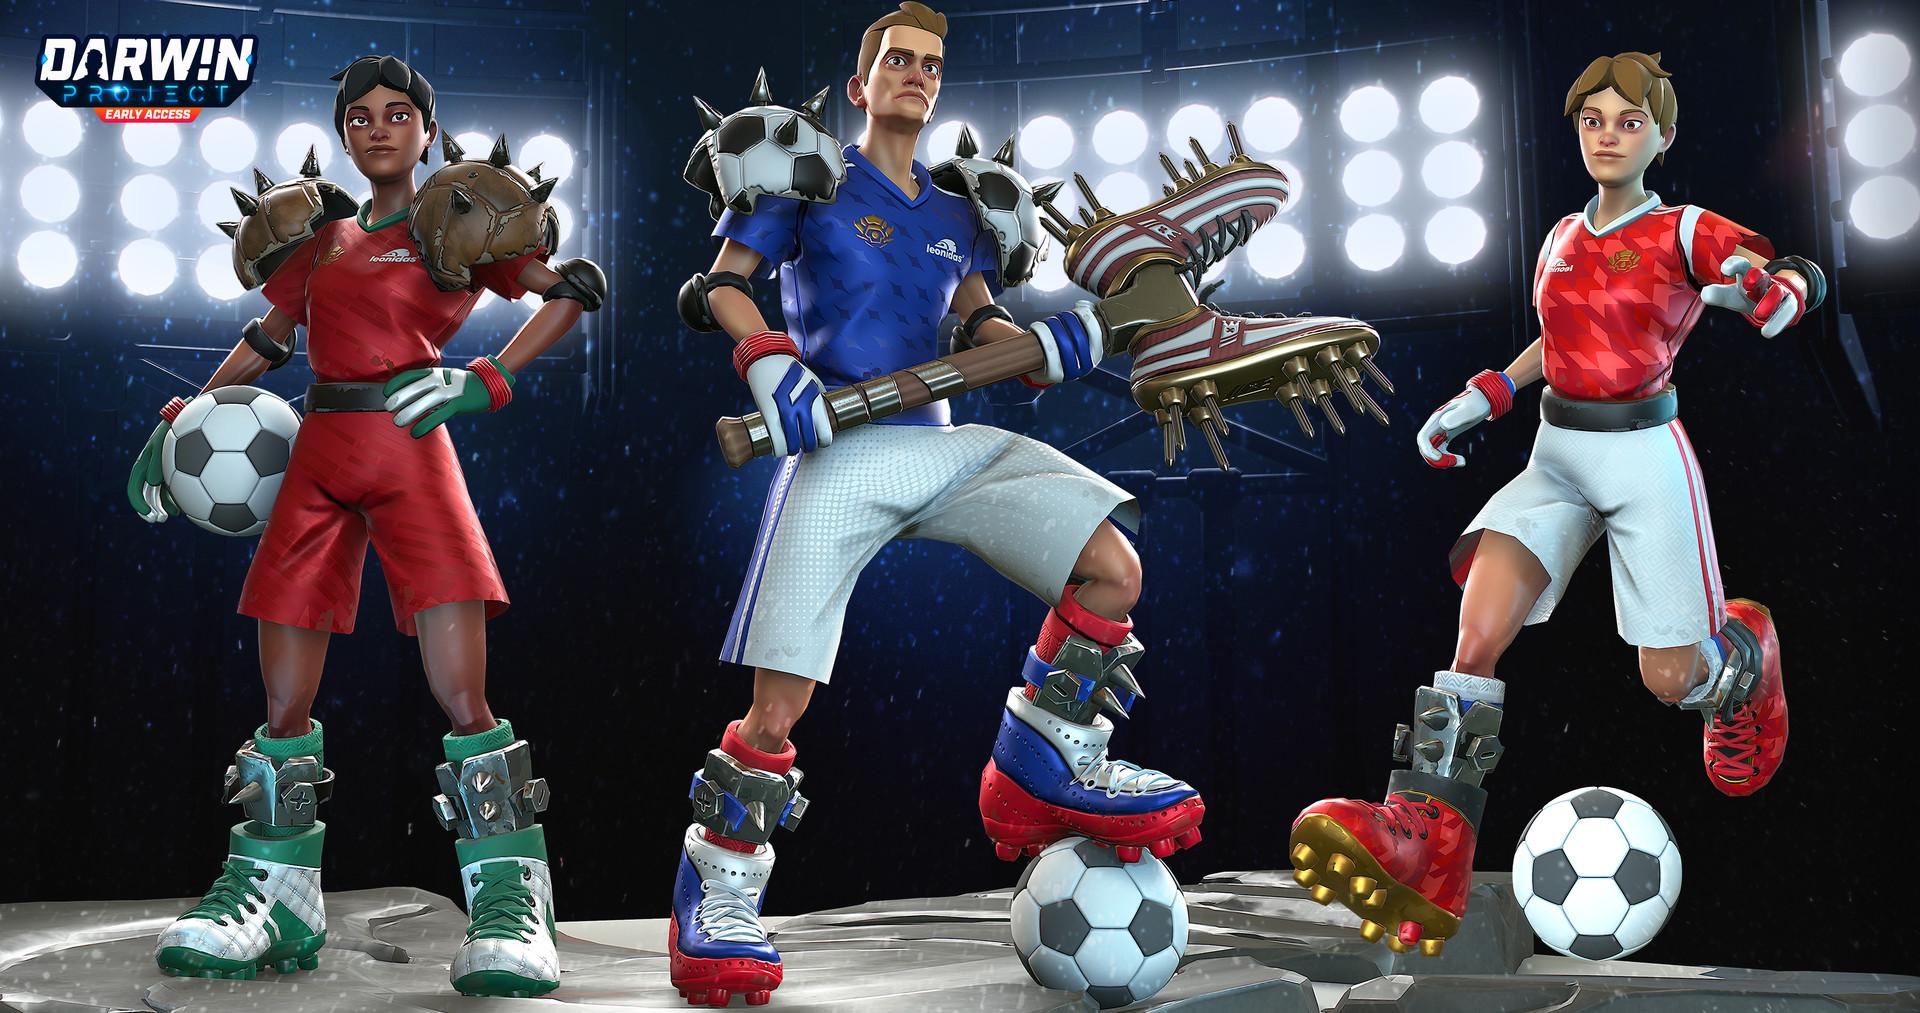 Felix arsenault soccereventb